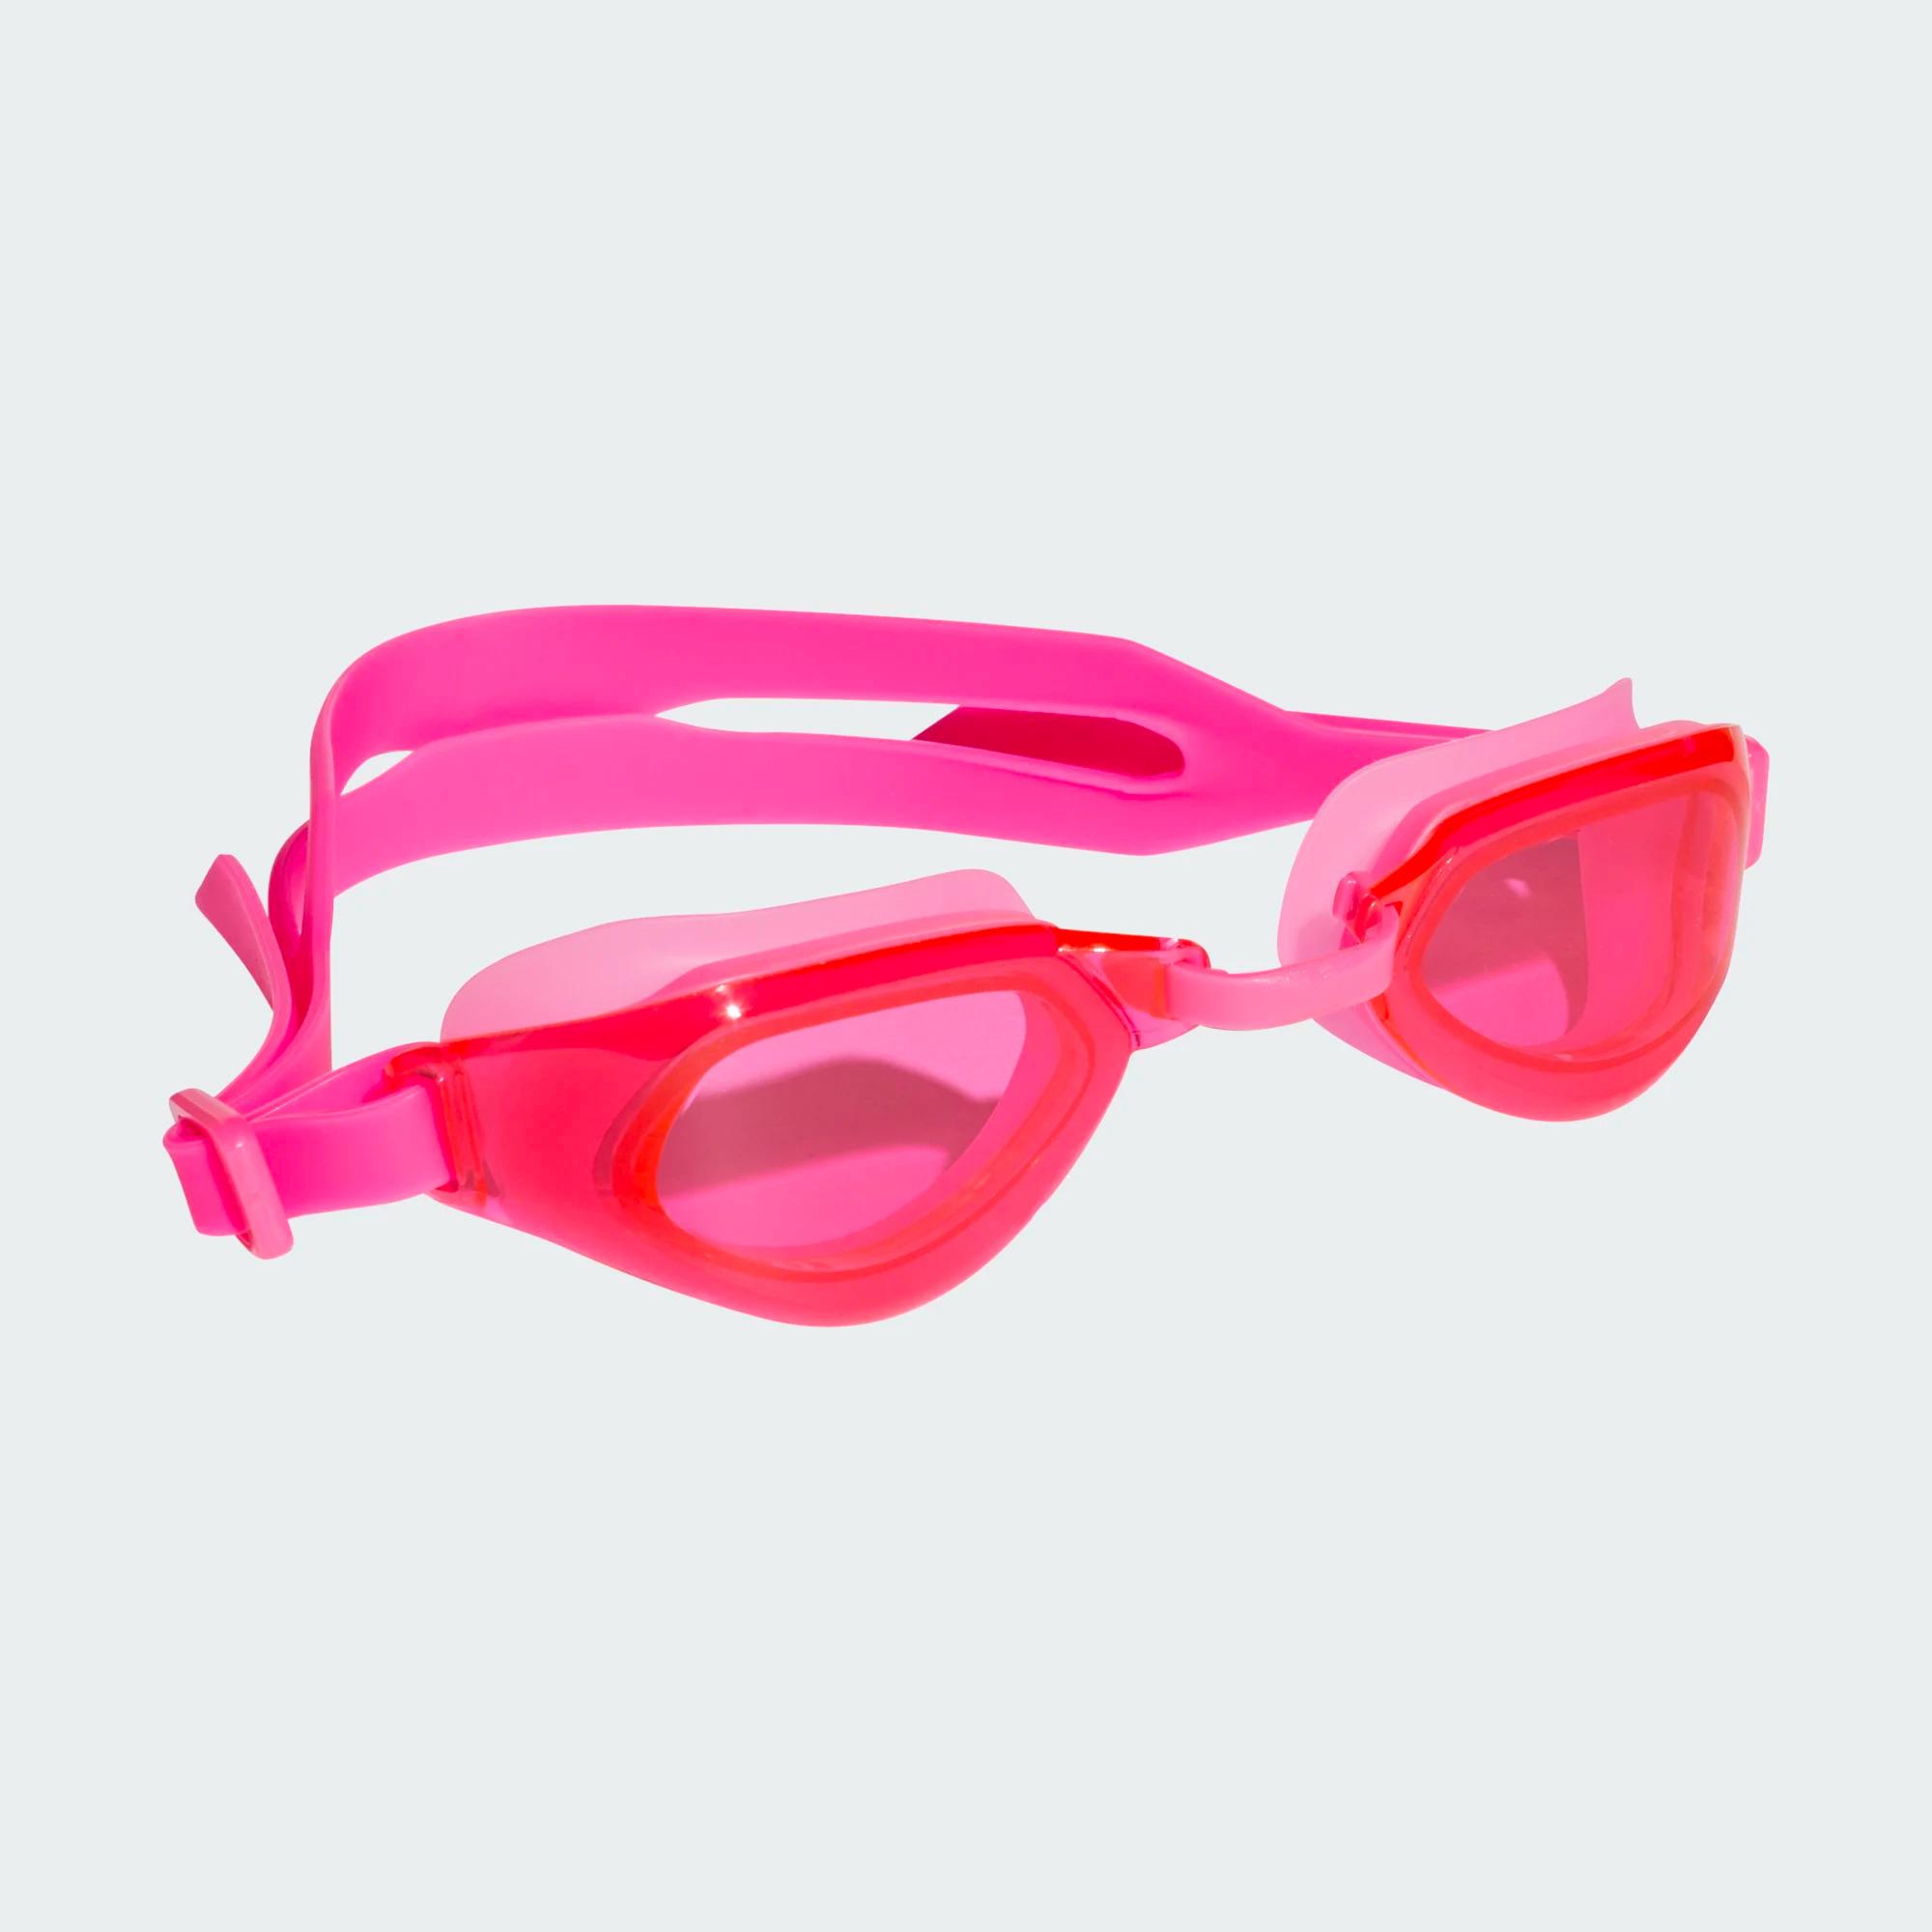 Adidas Persistar Fit Unmirrored Junior Schwimmbrille - pink